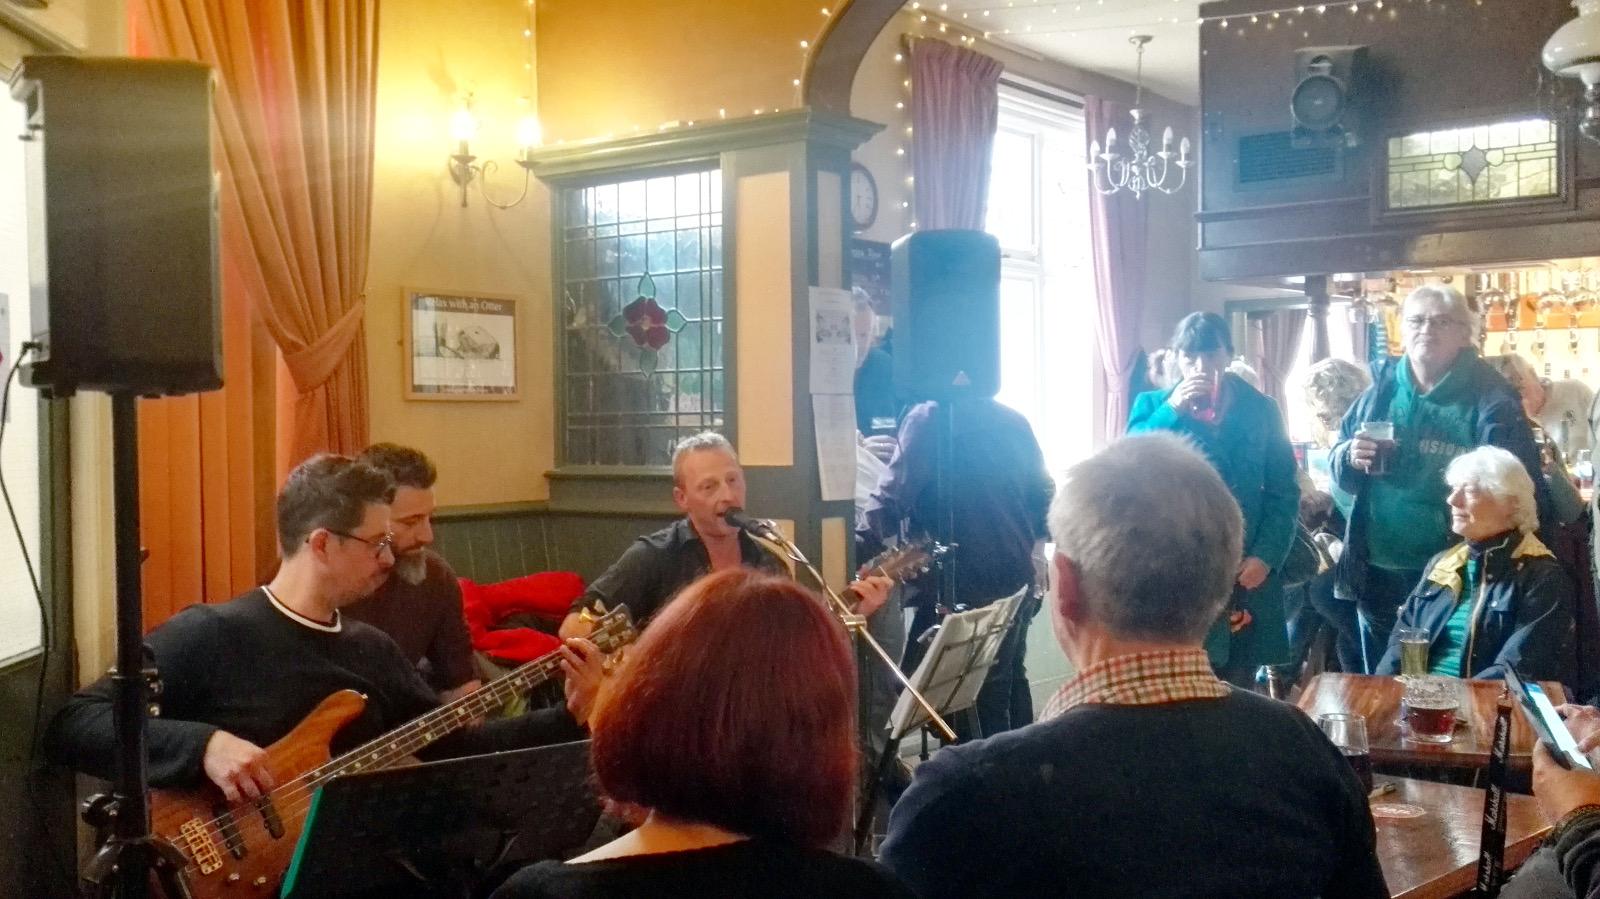 Pub The Bicton Inn - Exmouth (UK)